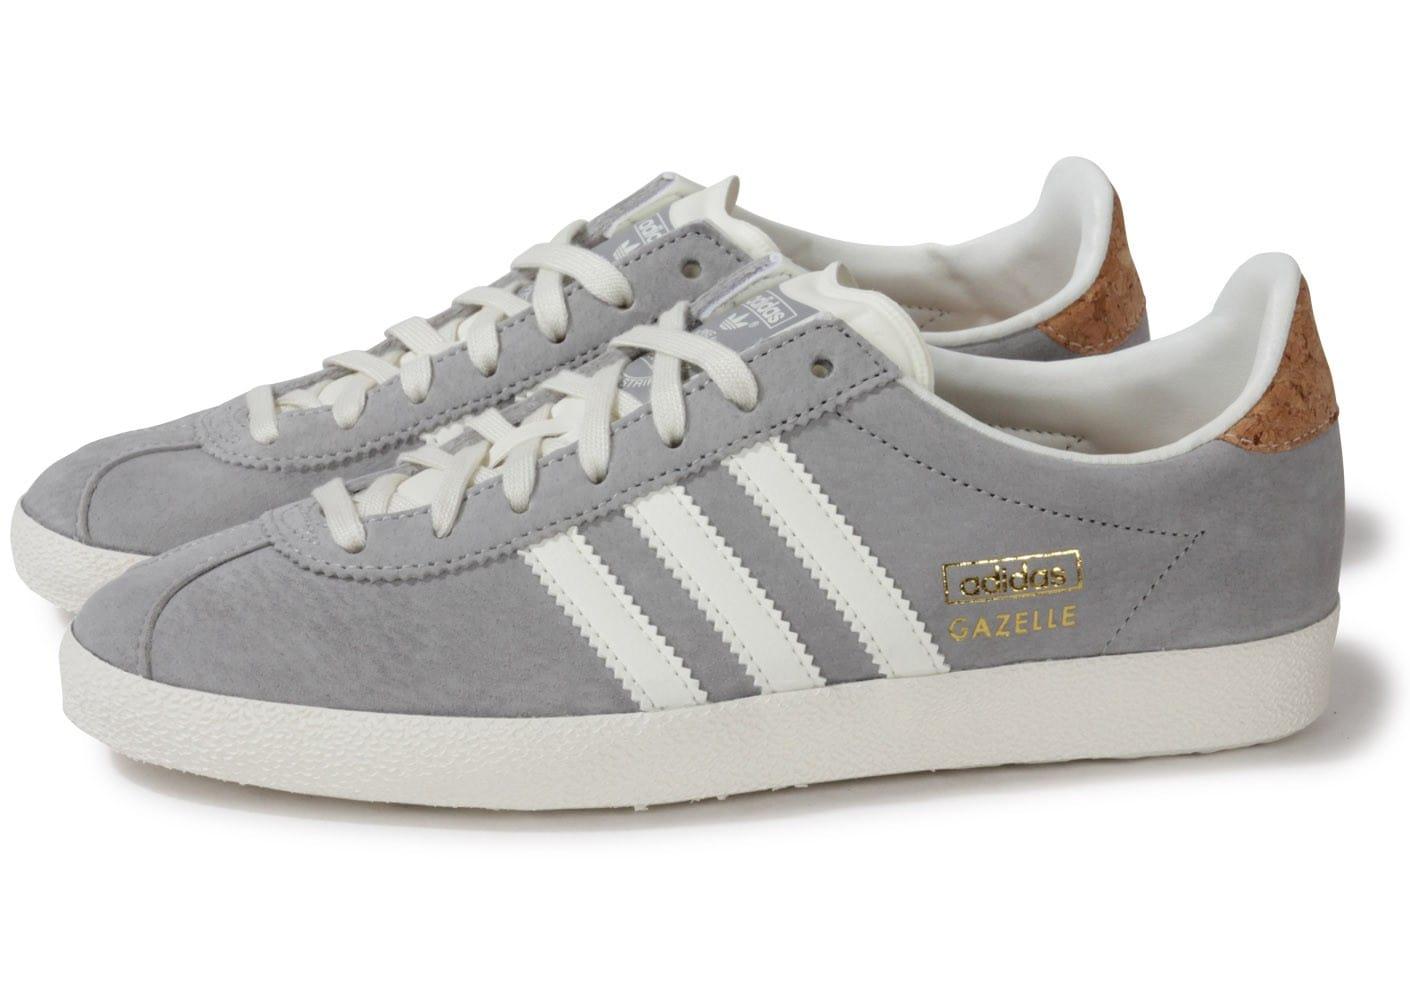 adidas gazelle femme grise clair